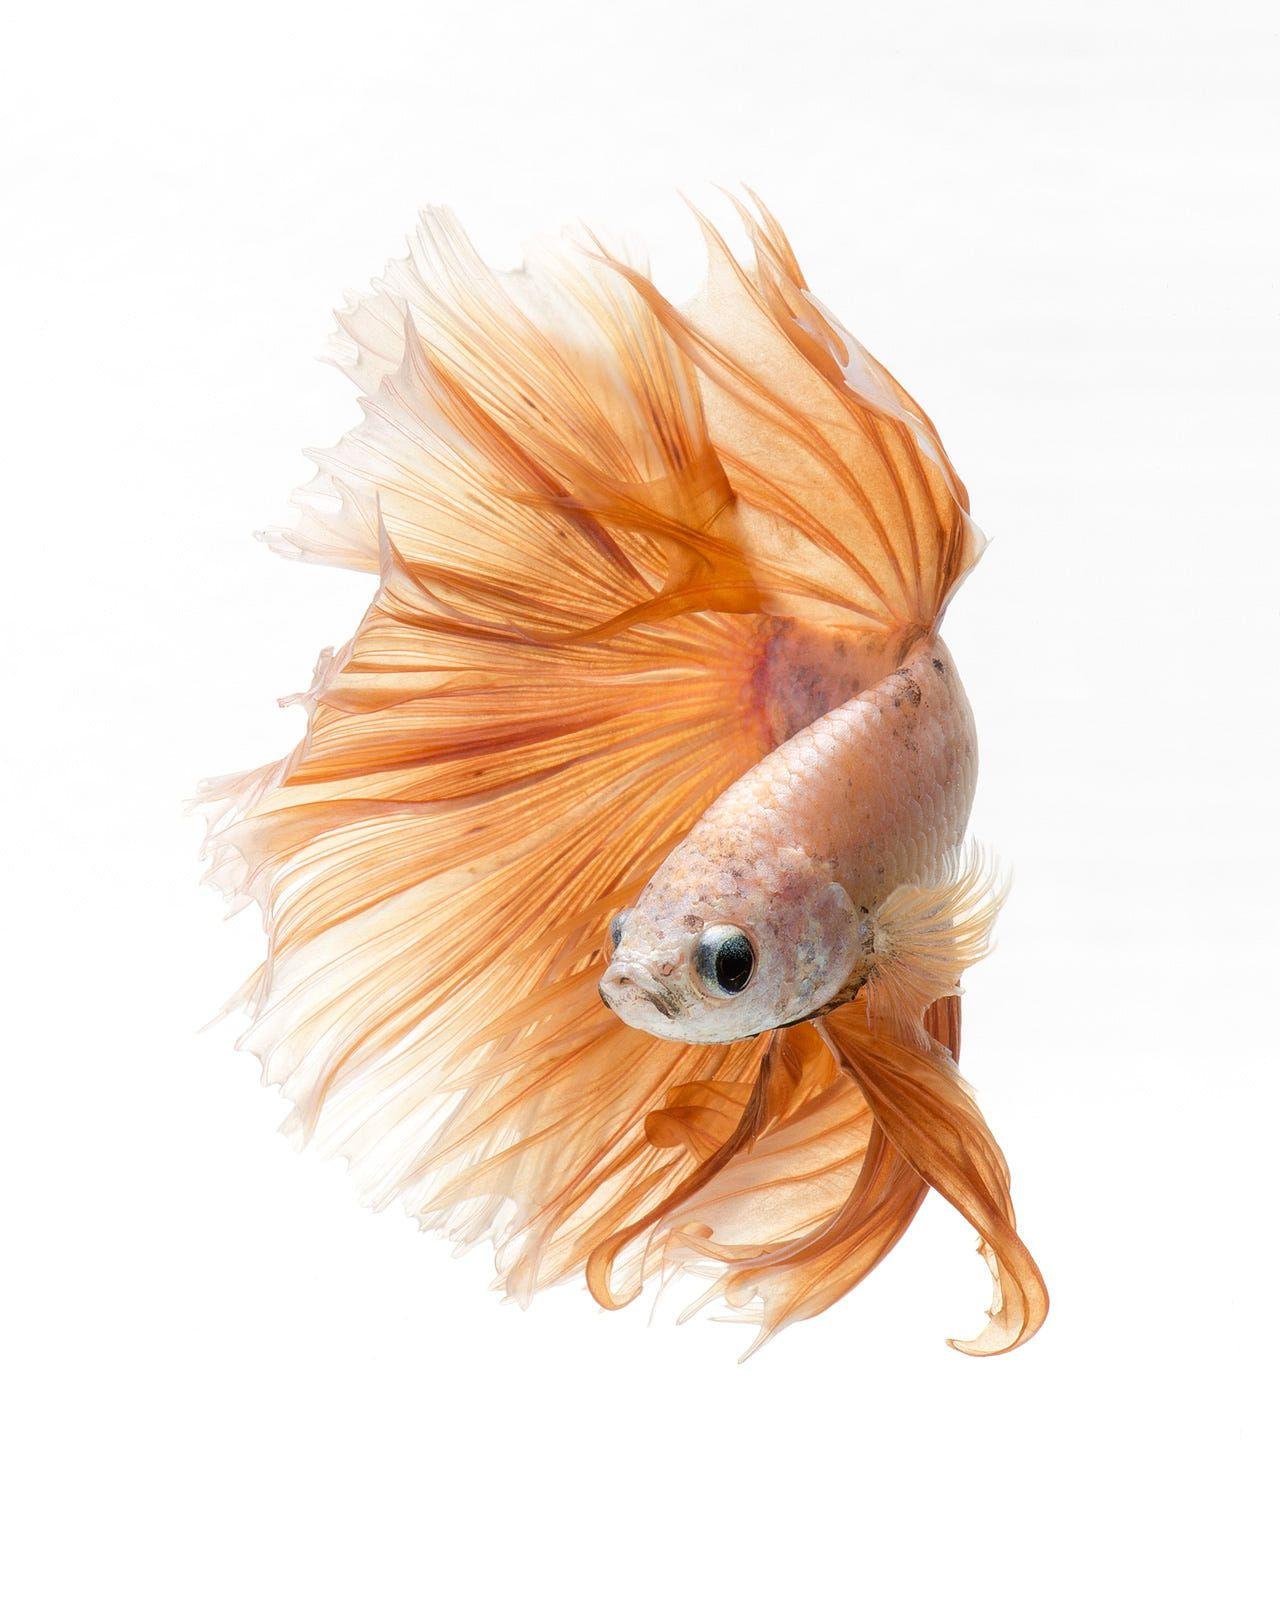 Siamese Fighting Fish; Mr. Peach by Jirawat Plekhongthu on 500px ...